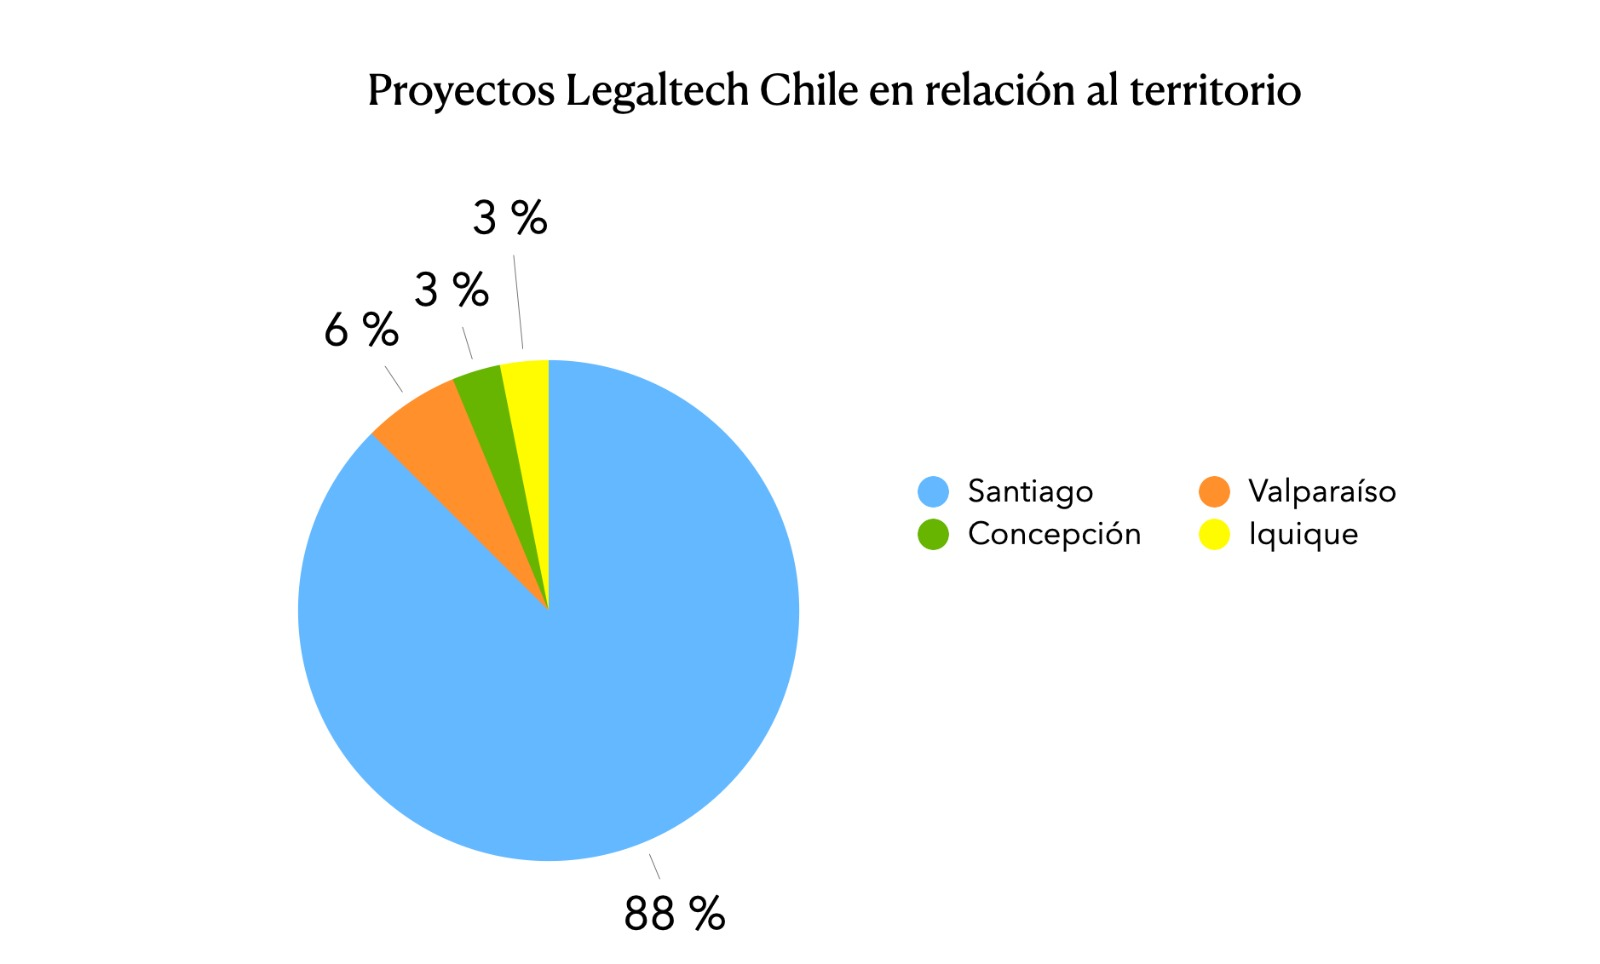 https://i1.wp.com/legaltechies.es/wp-content/uploads/2020/09/Mapa-geogra%CC%81fico.jpg?ssl=1